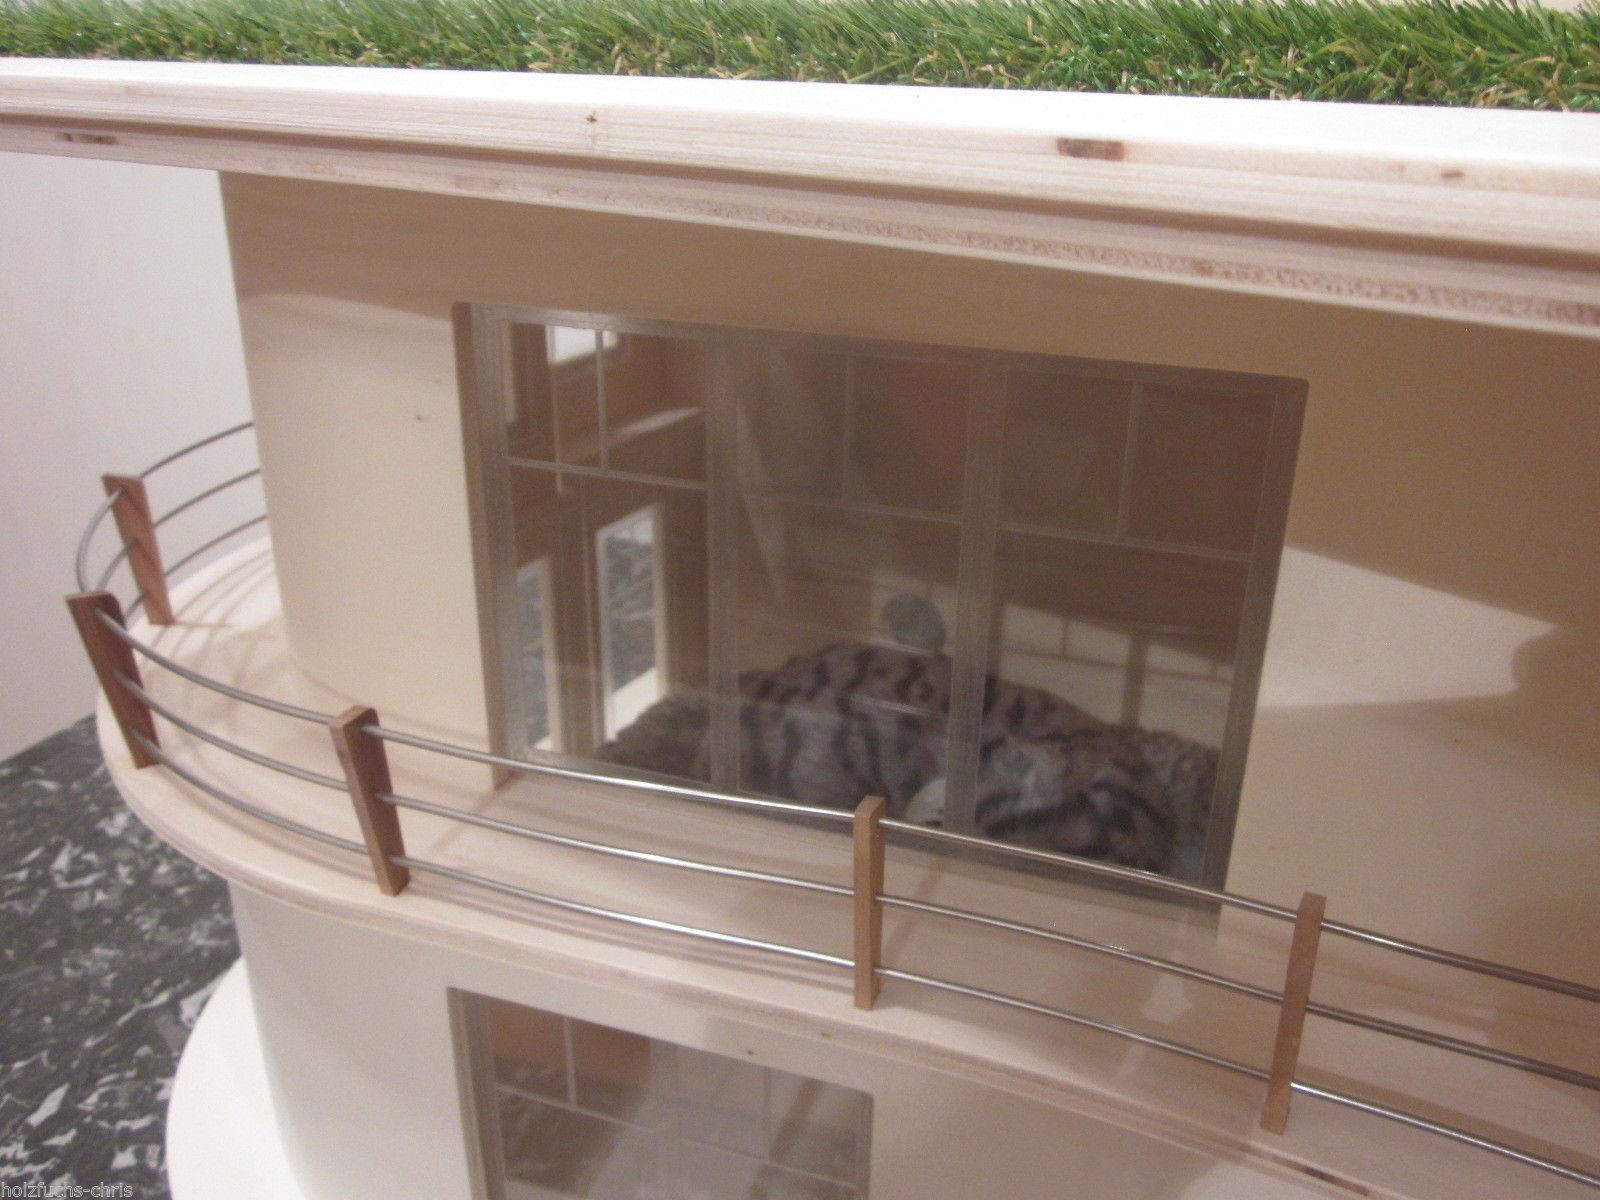 katzenhaus villa bauhaus unlasiert 4 katzen eldorado. Black Bedroom Furniture Sets. Home Design Ideas